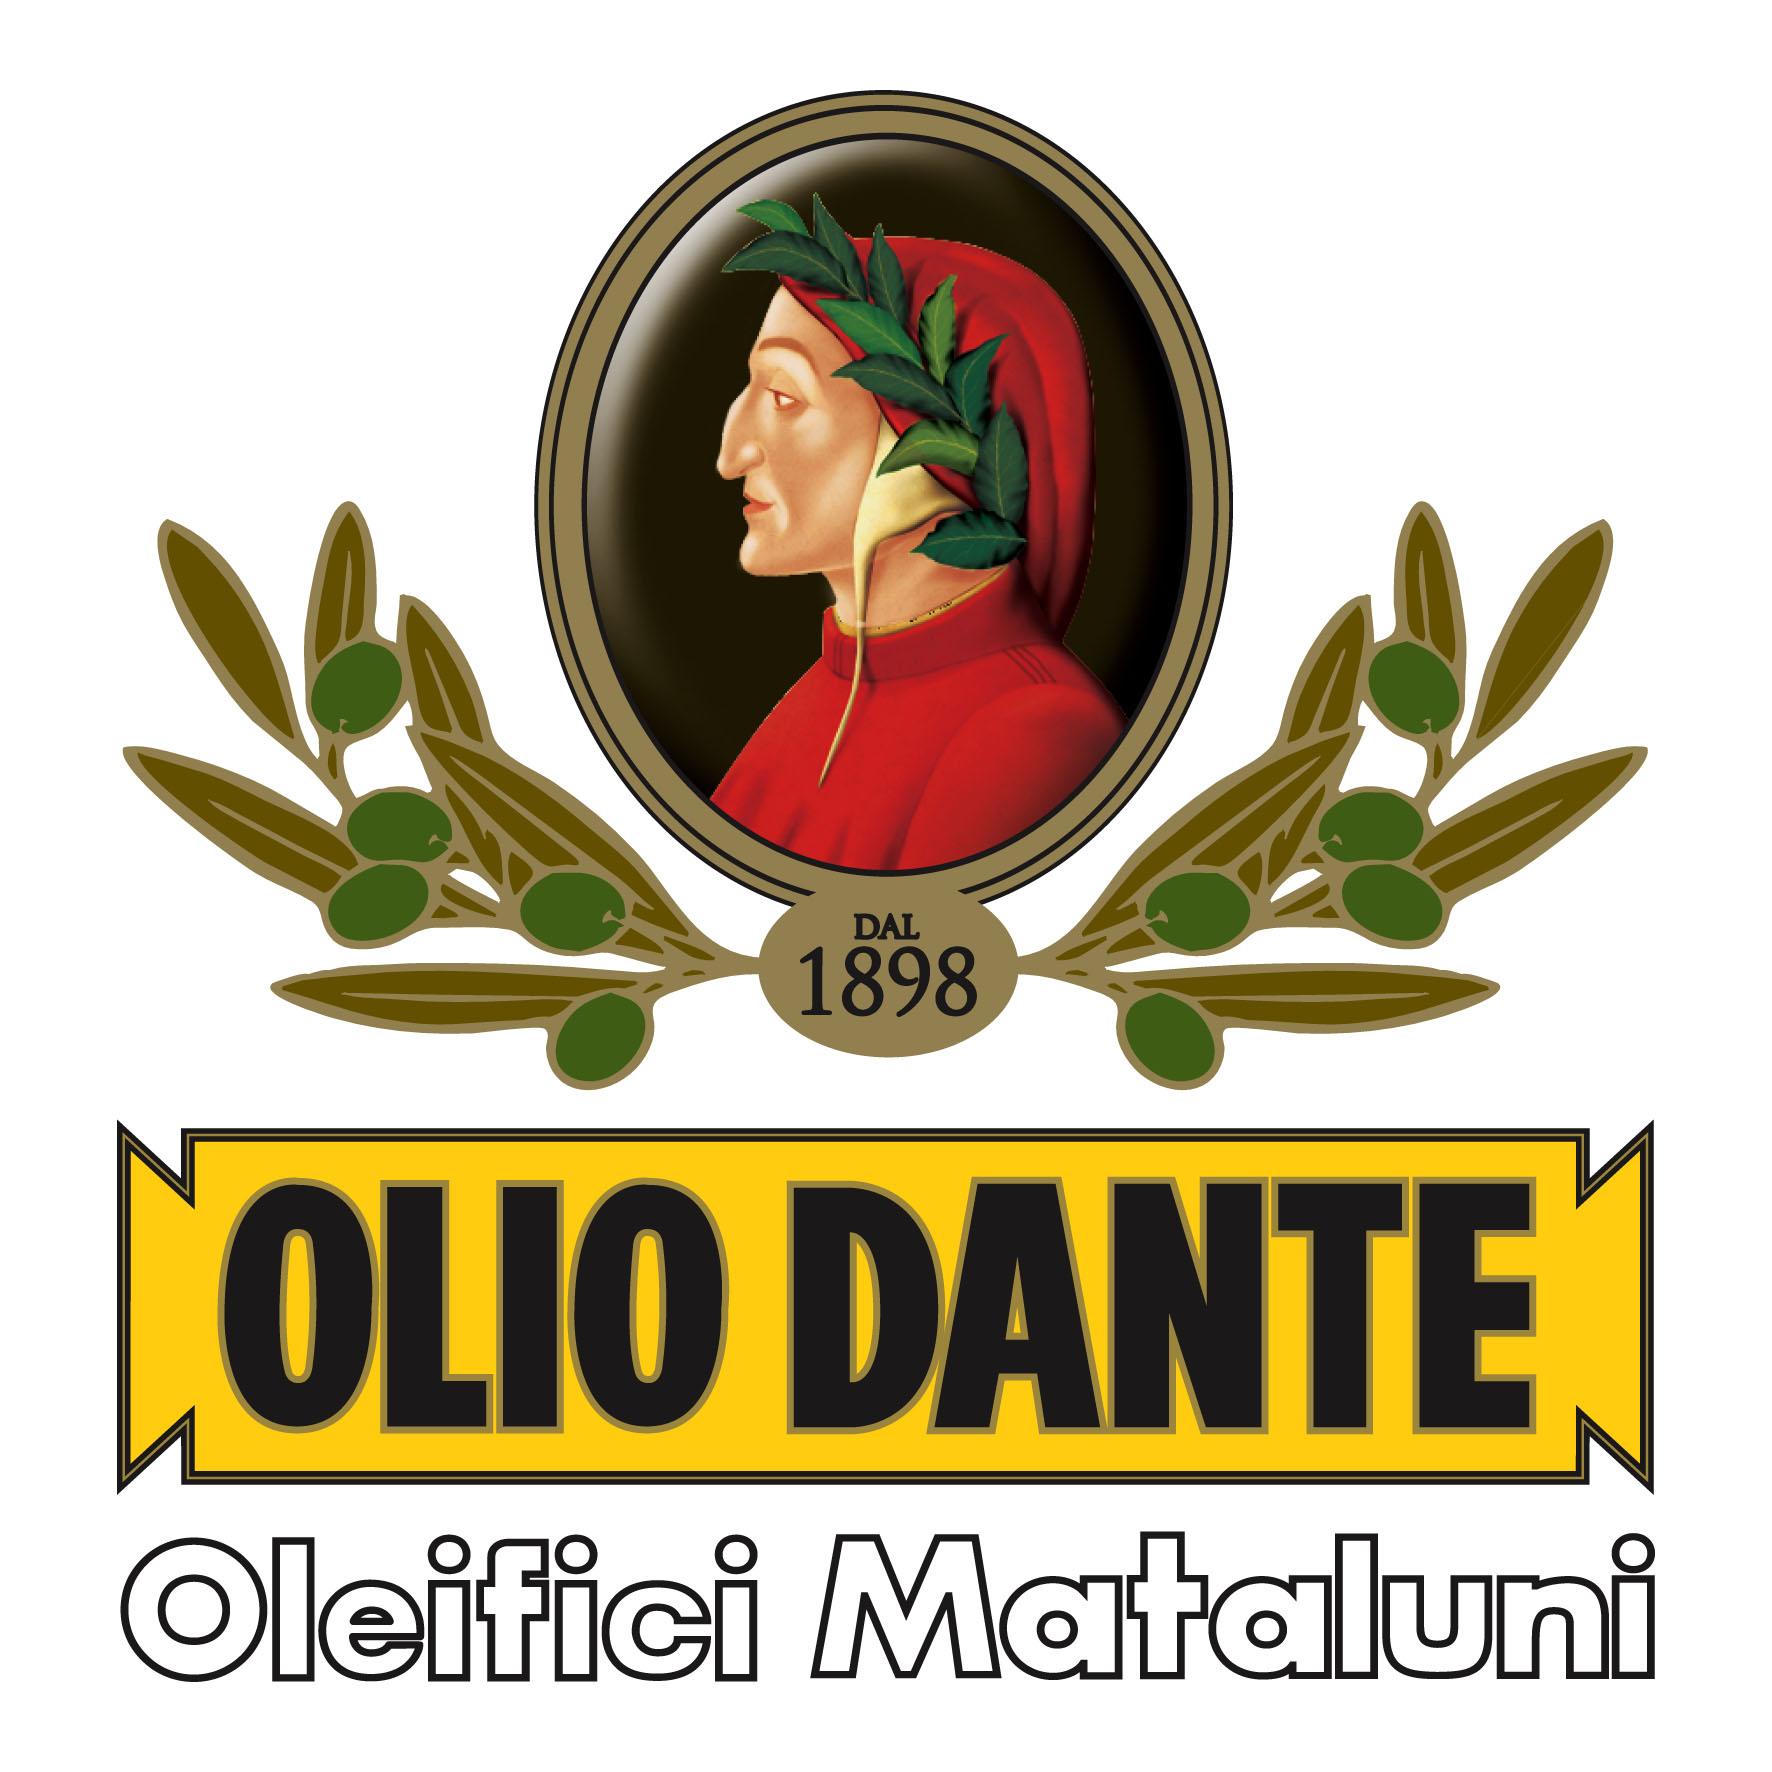 Oliodante_Oleifici_Mataluni